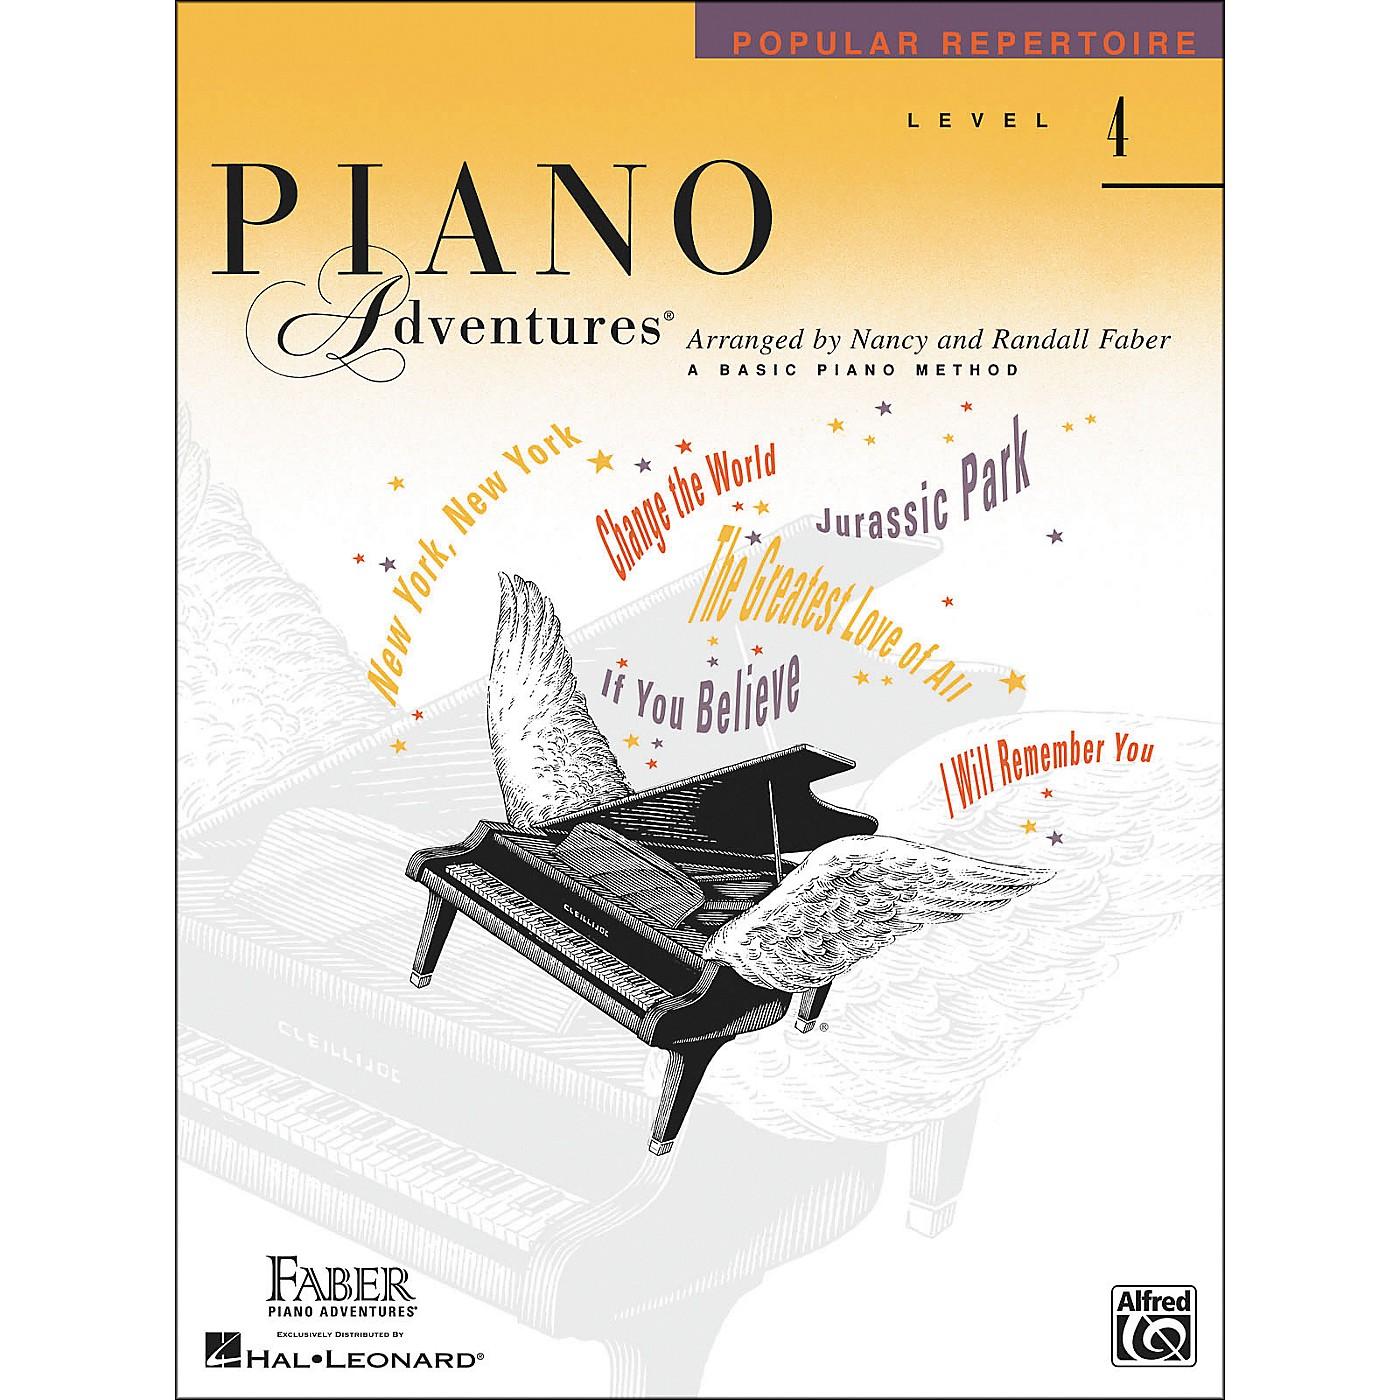 Faber Piano Adventures Piano Adventures Popular Repertoire Level 4 - Faber Piano thumbnail